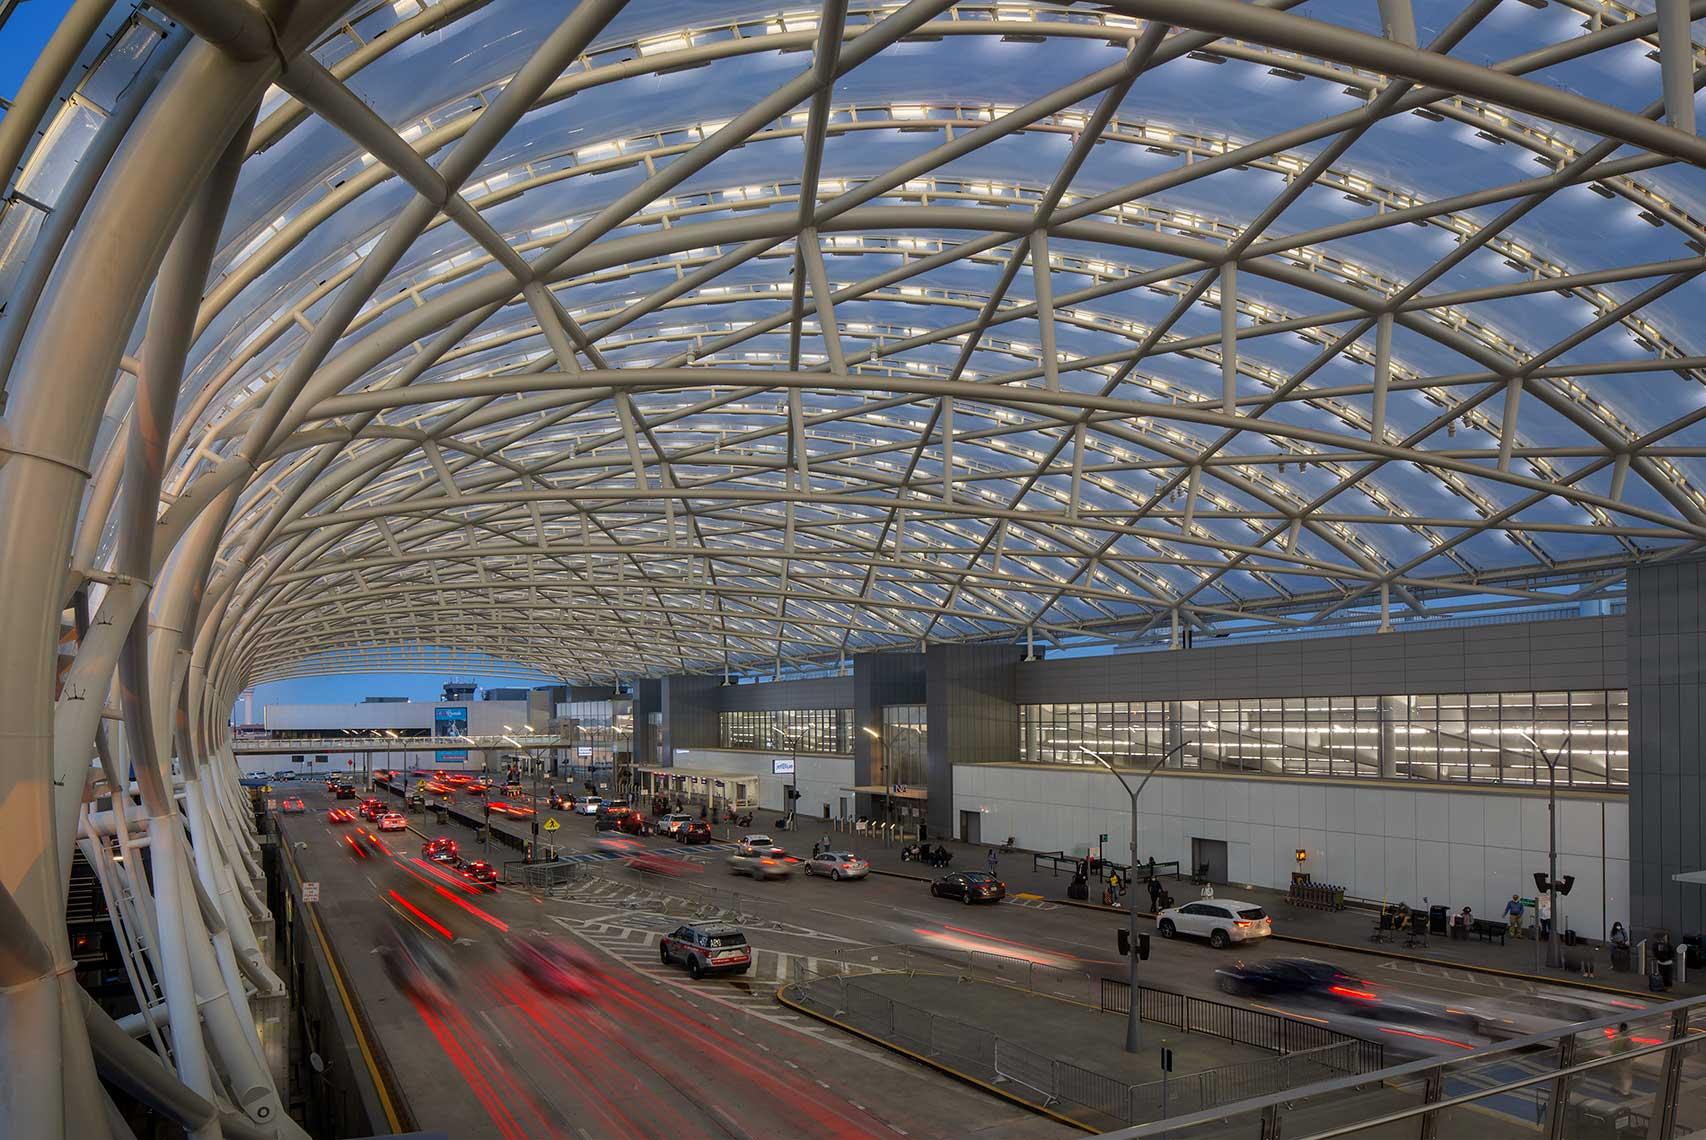 The North Terminal canopy at Hartsfield Jackson Atlanta International Airport glows at twilight